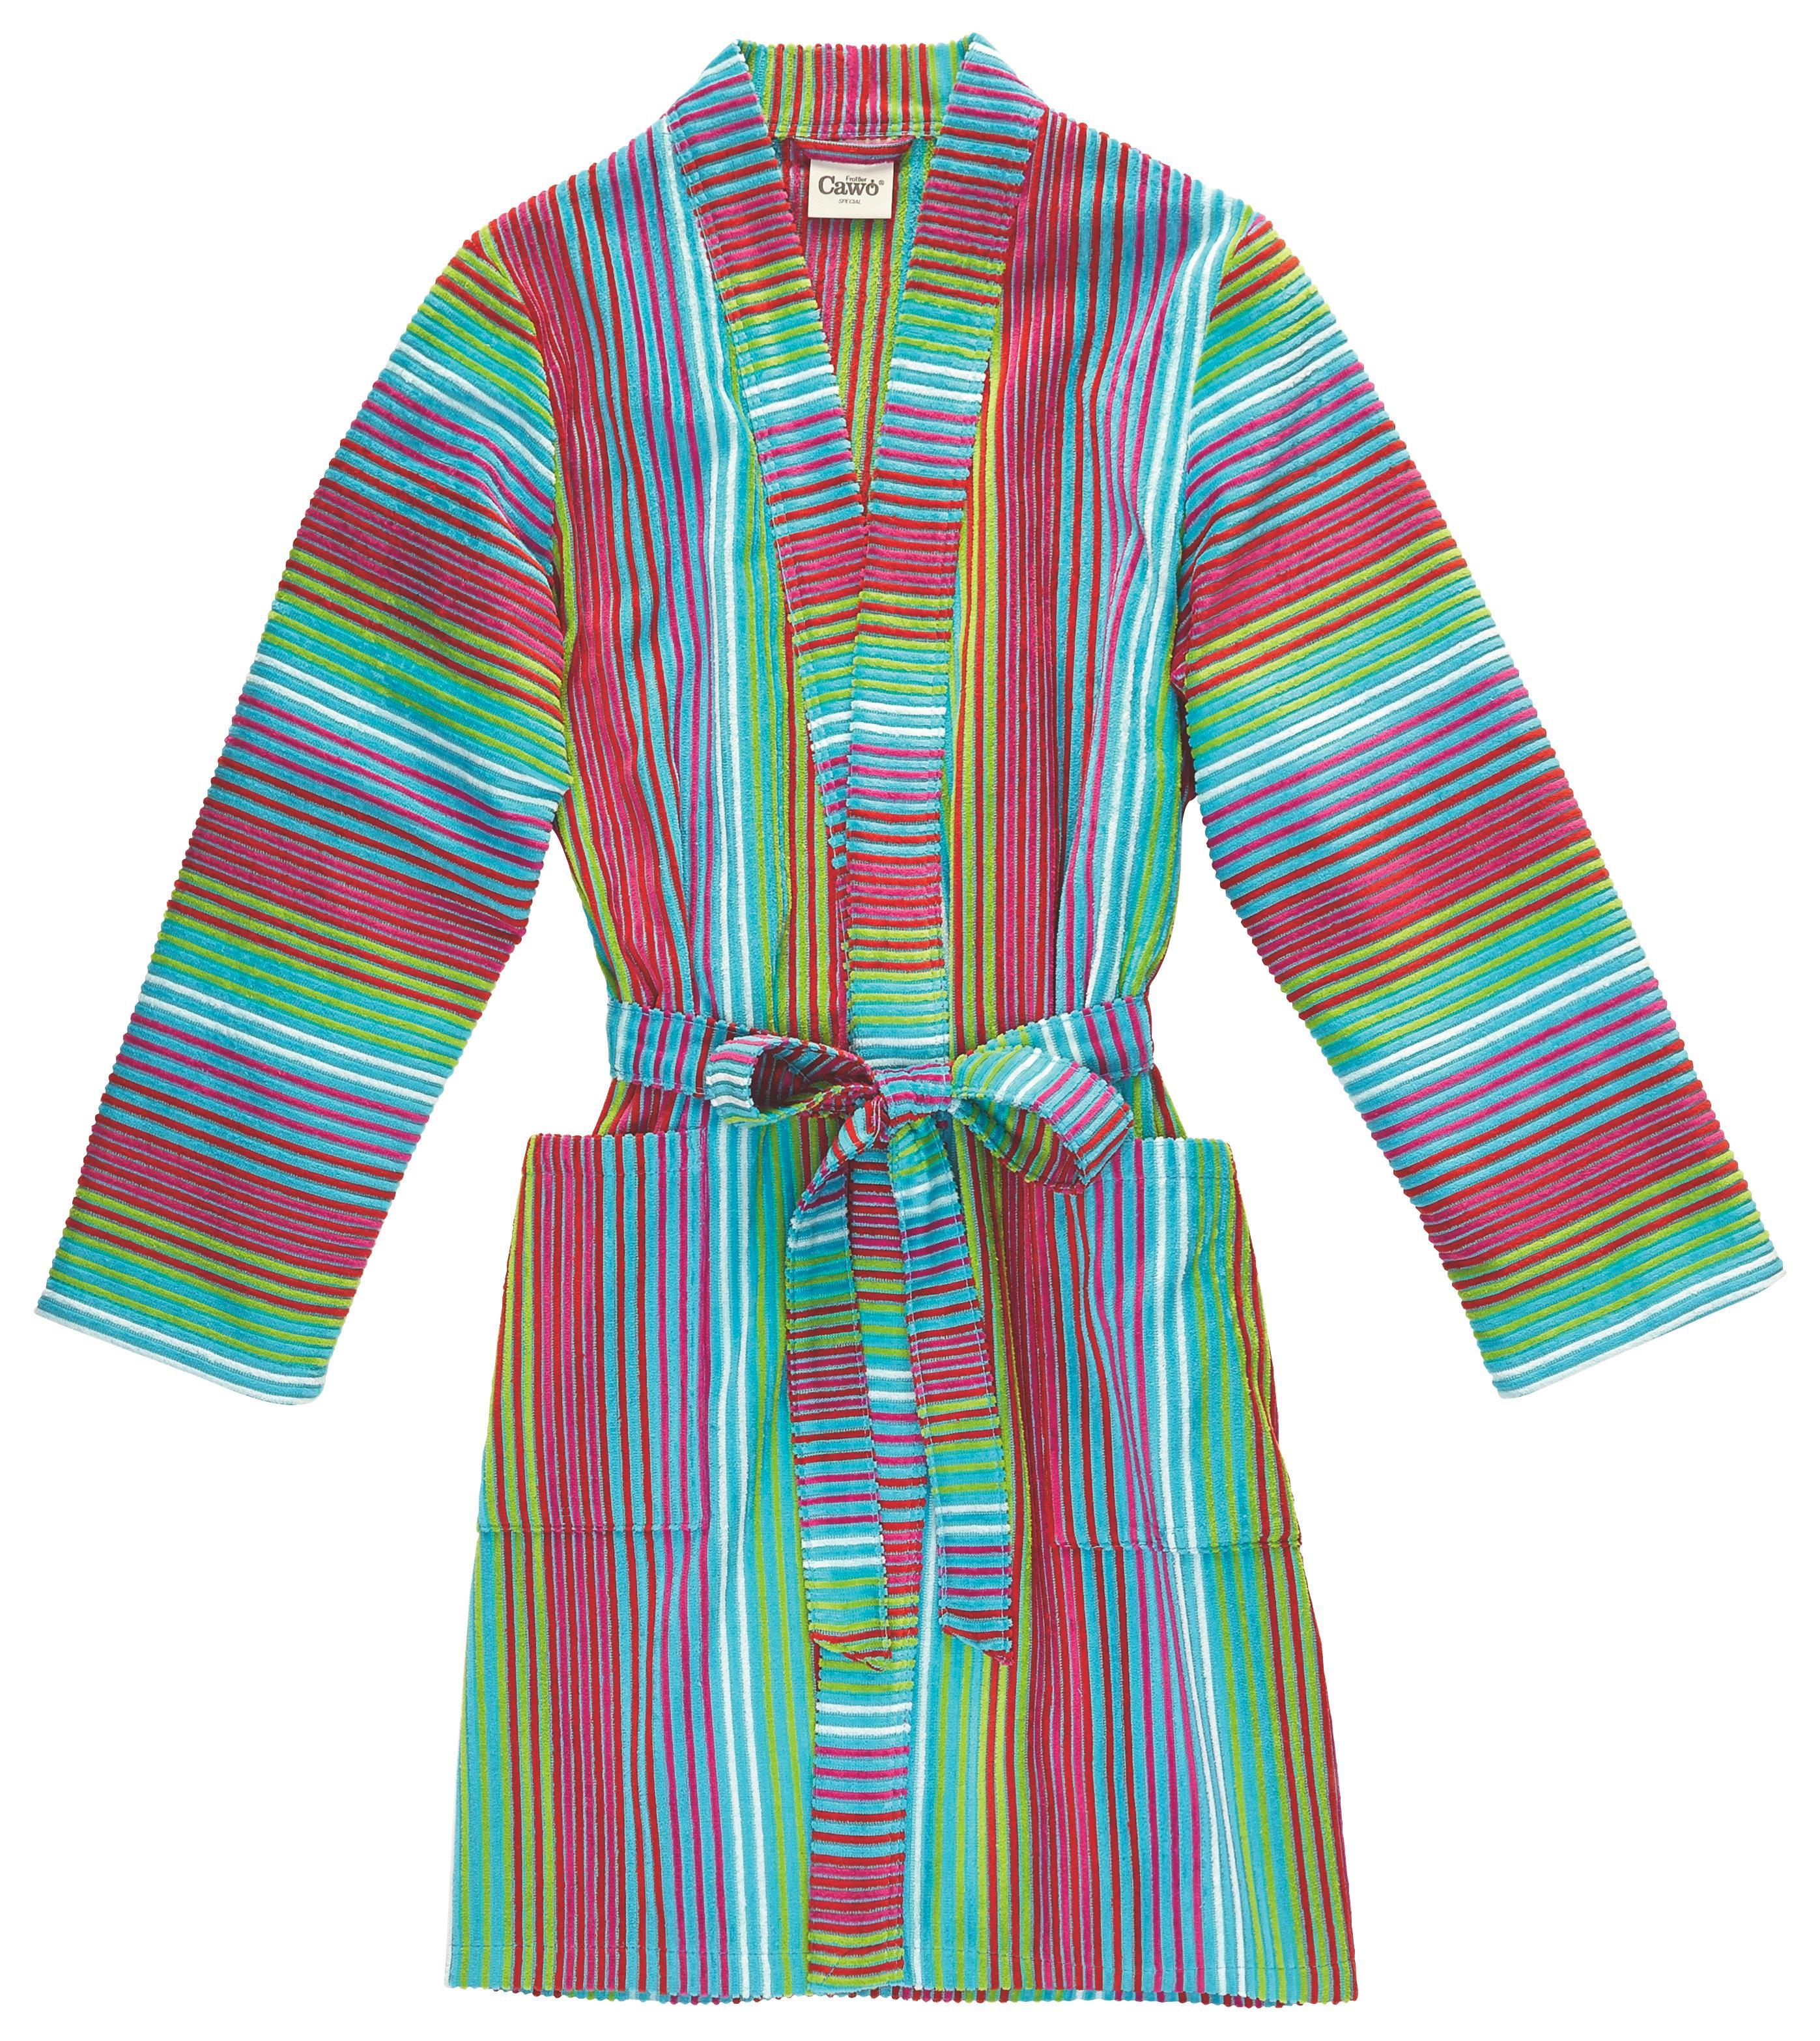 BADEMANTEL  Multicolor - Multicolor, Basics, Textil (40/42) - CAWOE